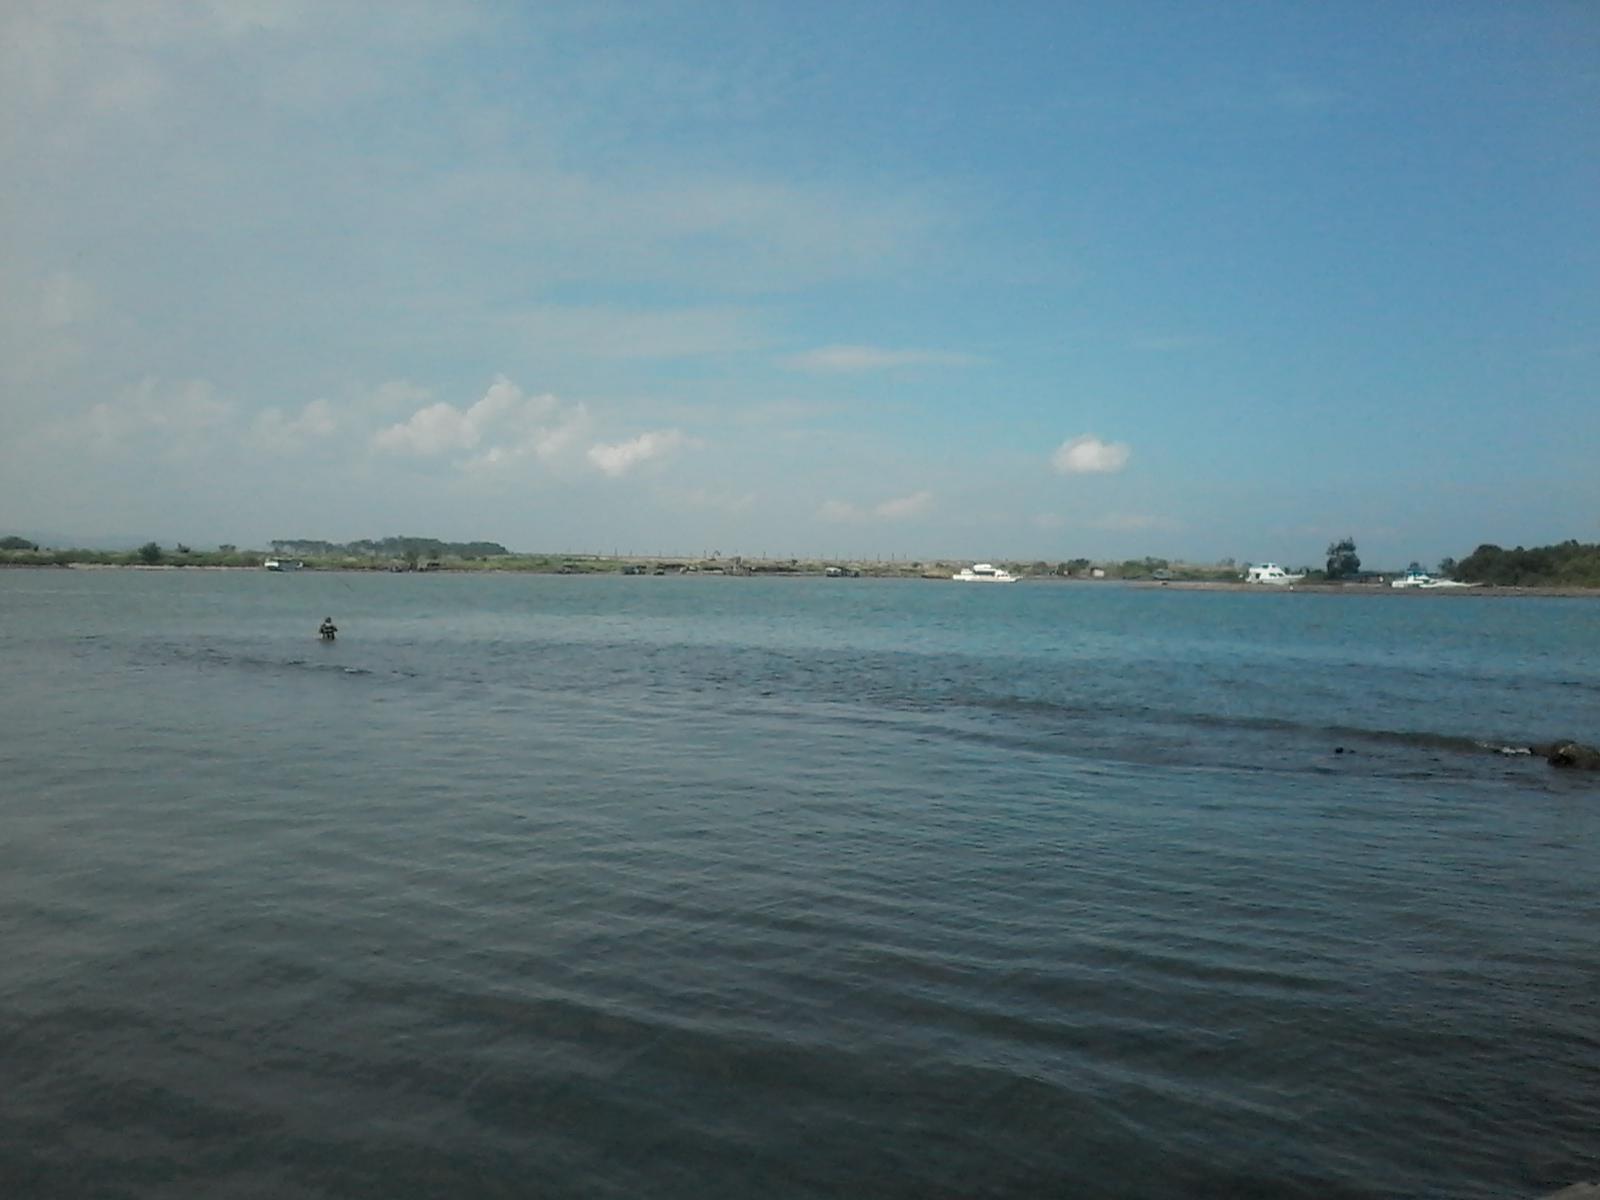 440 pemandangan pantai marina semarang Gratis